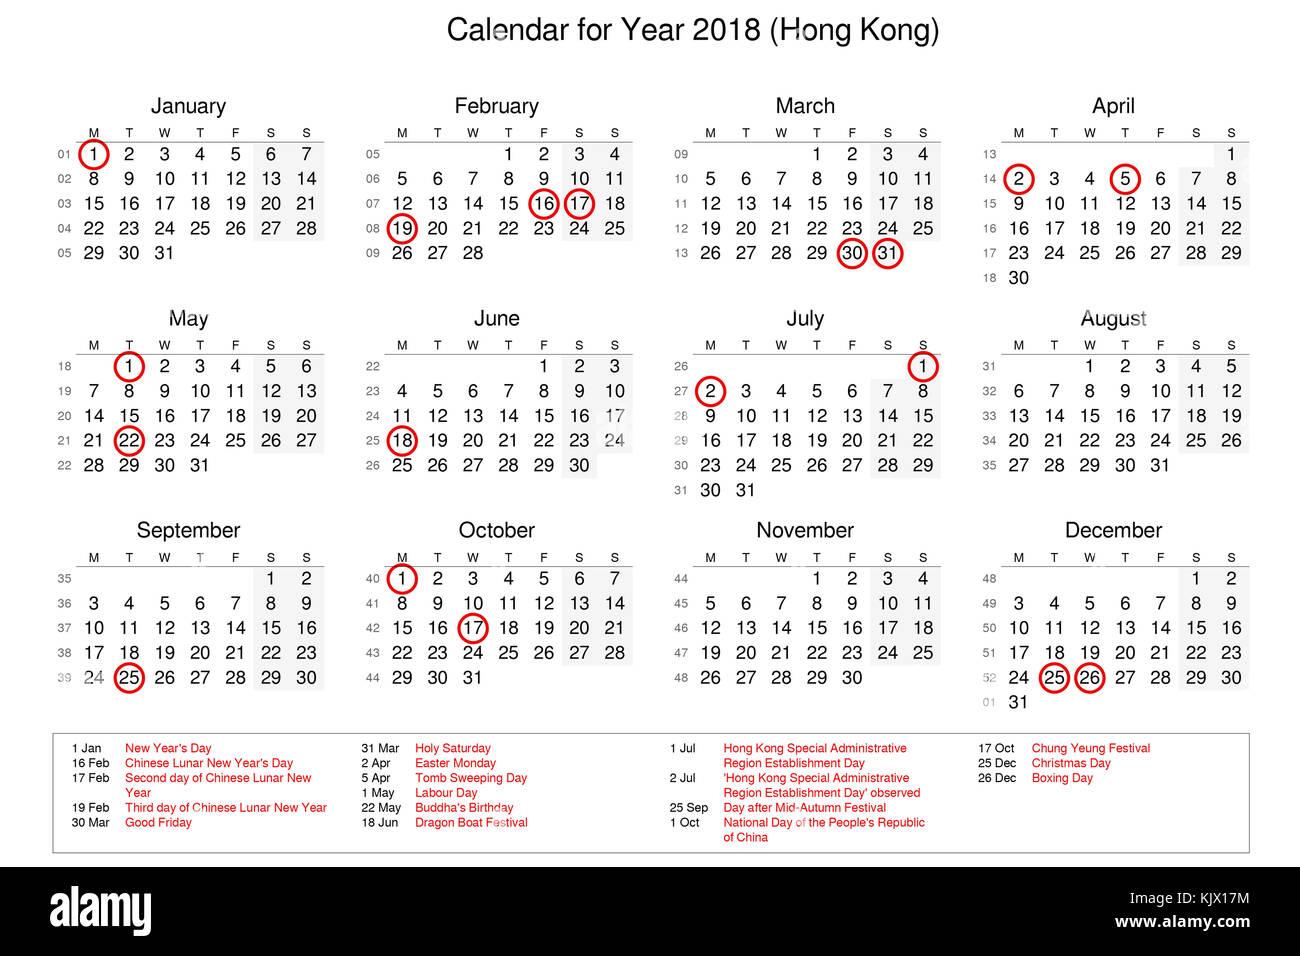 Calendar April Hong Kong : Calendar of year with public holidays and bank